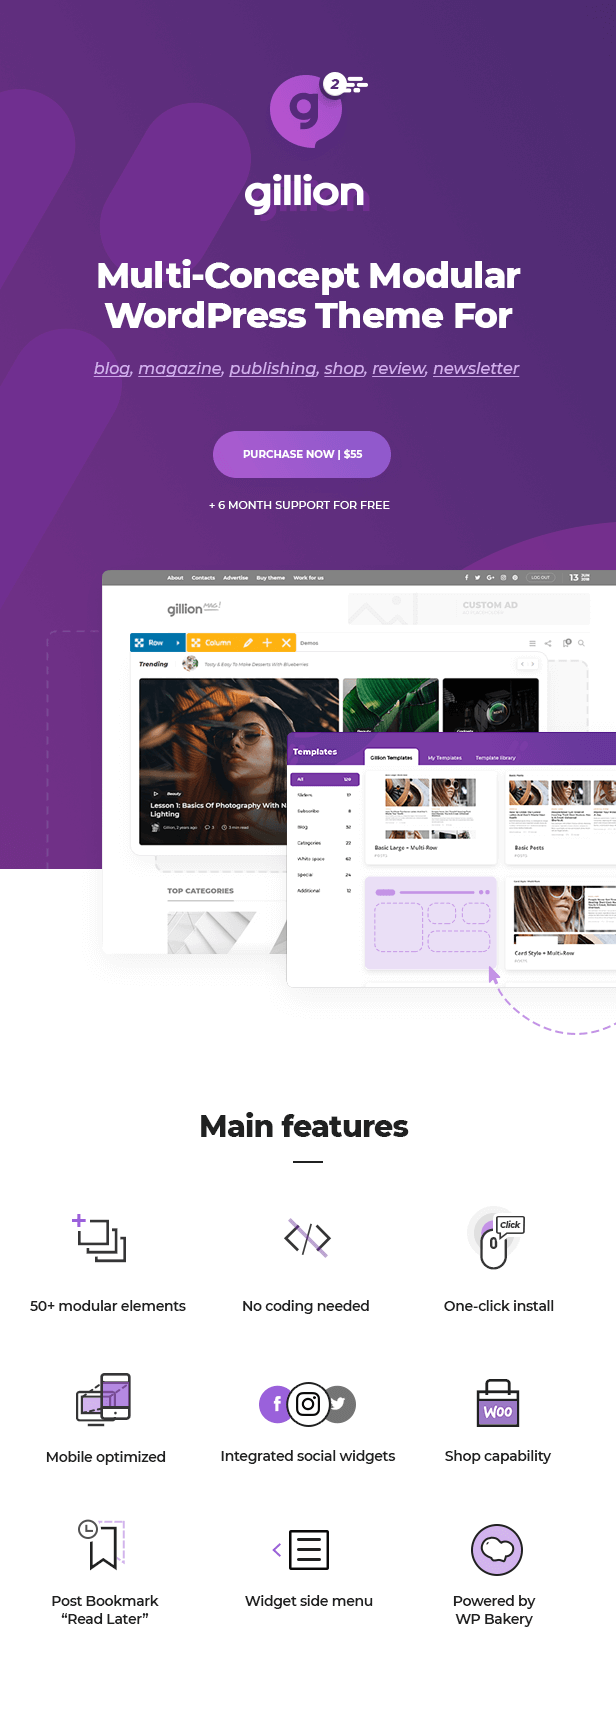 showcase1 - Gillion | Multi-Concept Blog/Magazine & Shop WordPress AMP Theme